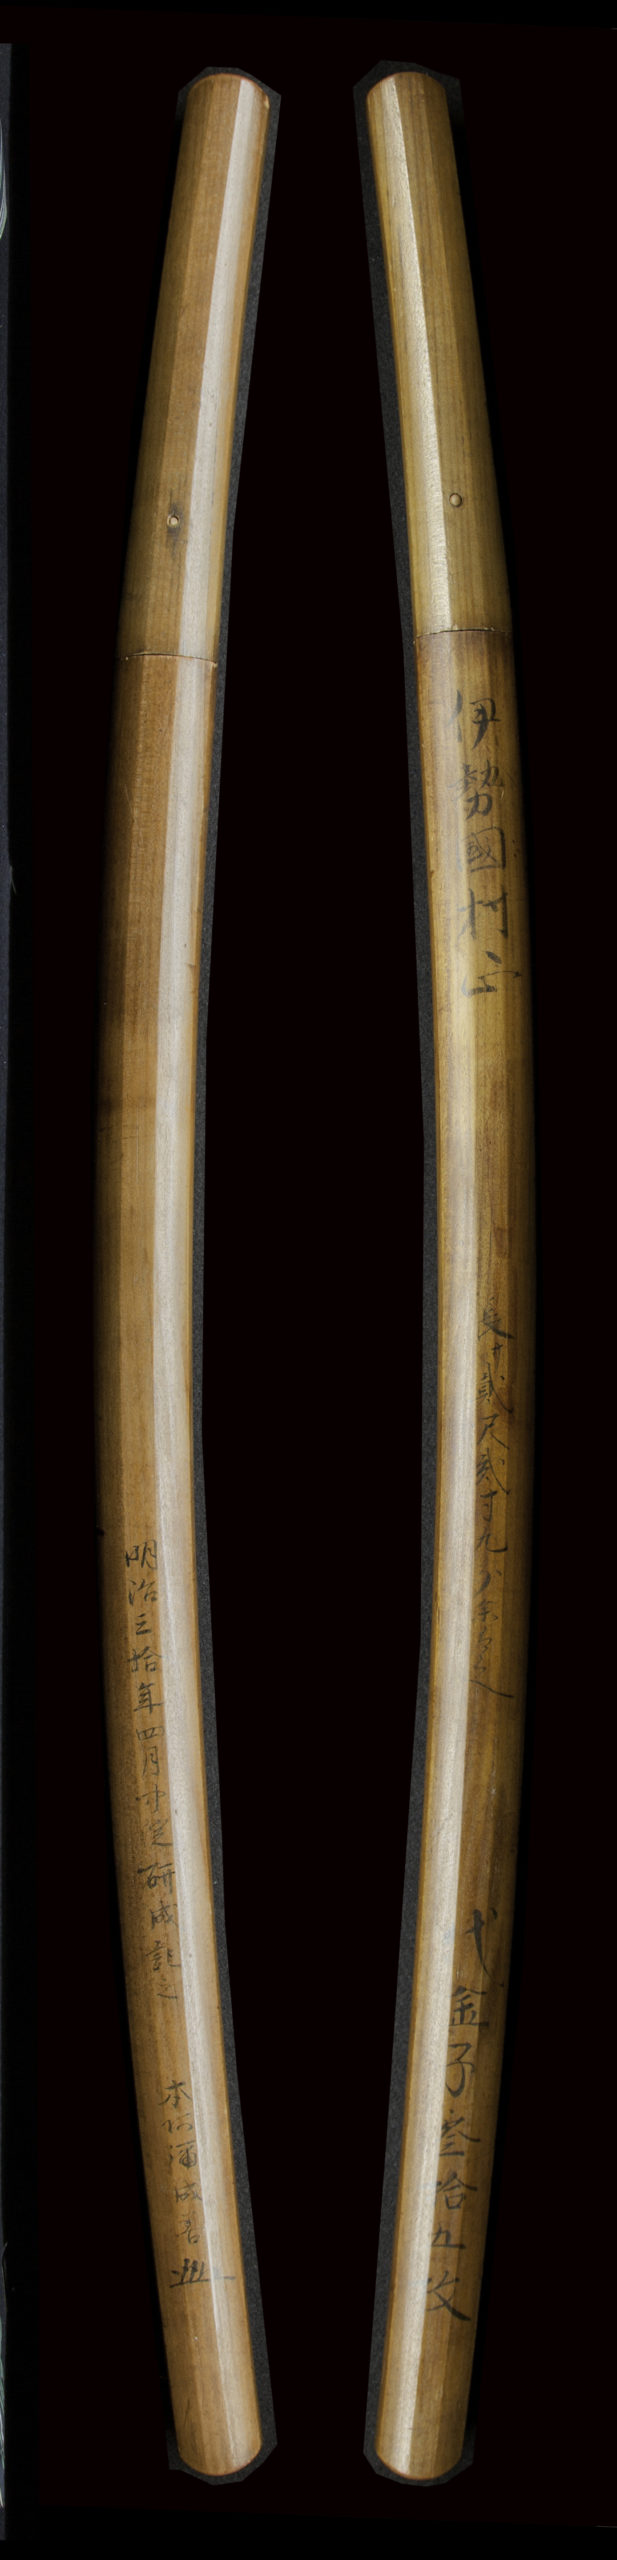 "Muramasa (村正, born before 1501), commonly known as Sengo Muramasa (千子村正), was a famous swordsmith who founded the Muramasa 初代村正(村正、1501年以前に生まれ)、通称""千子村正""は村正派を創設した有名な刀工でした。"